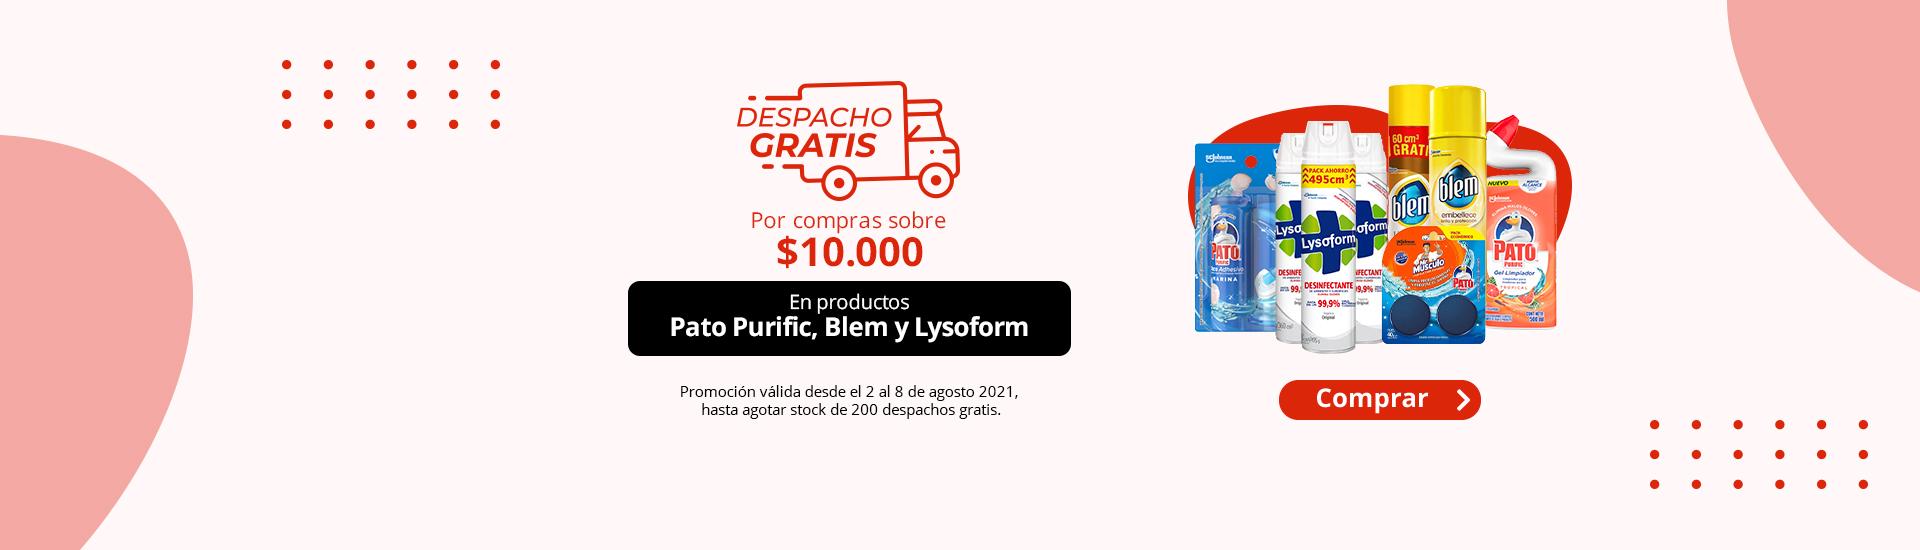 Pato - Blem - Lysoform - 7